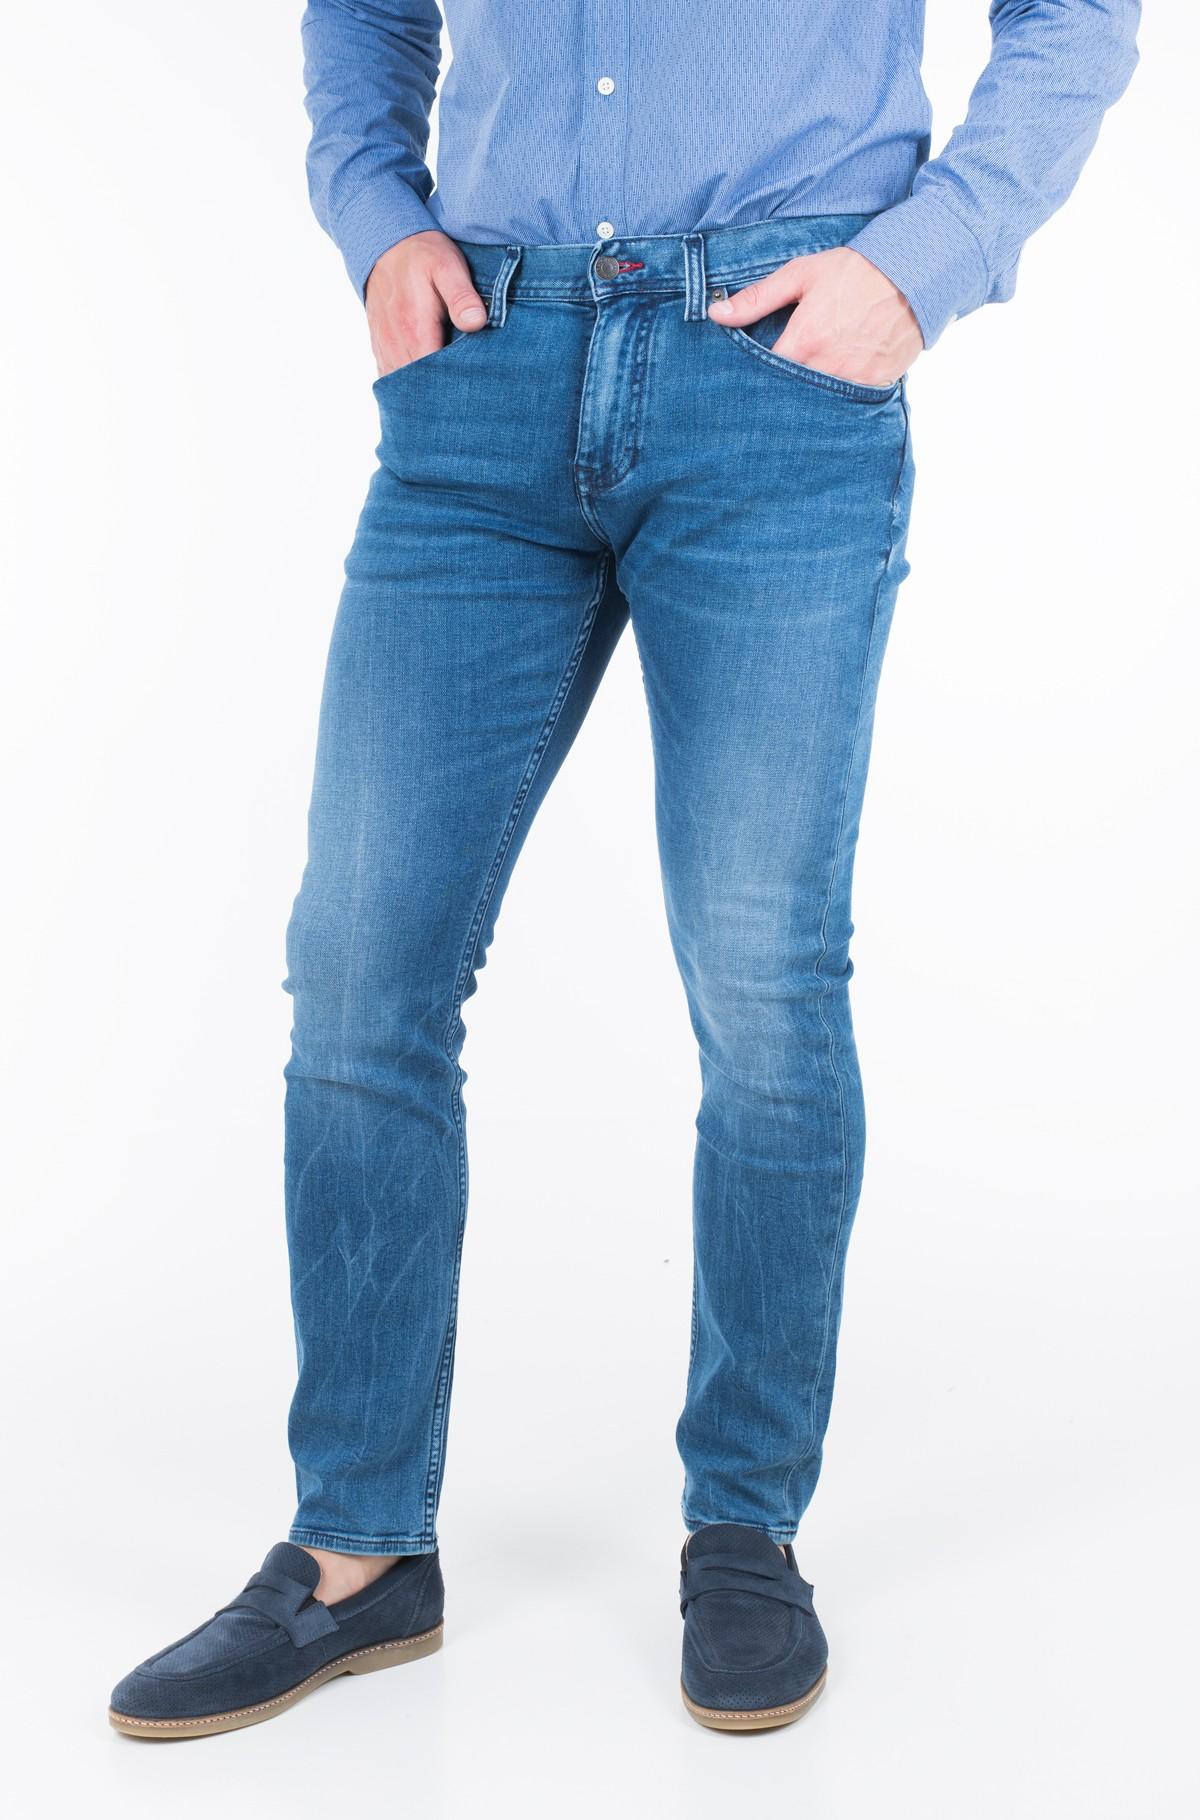 Džinsinės kelnės SLIM BLEECKER PSTR PORTAL BLUE-full-1